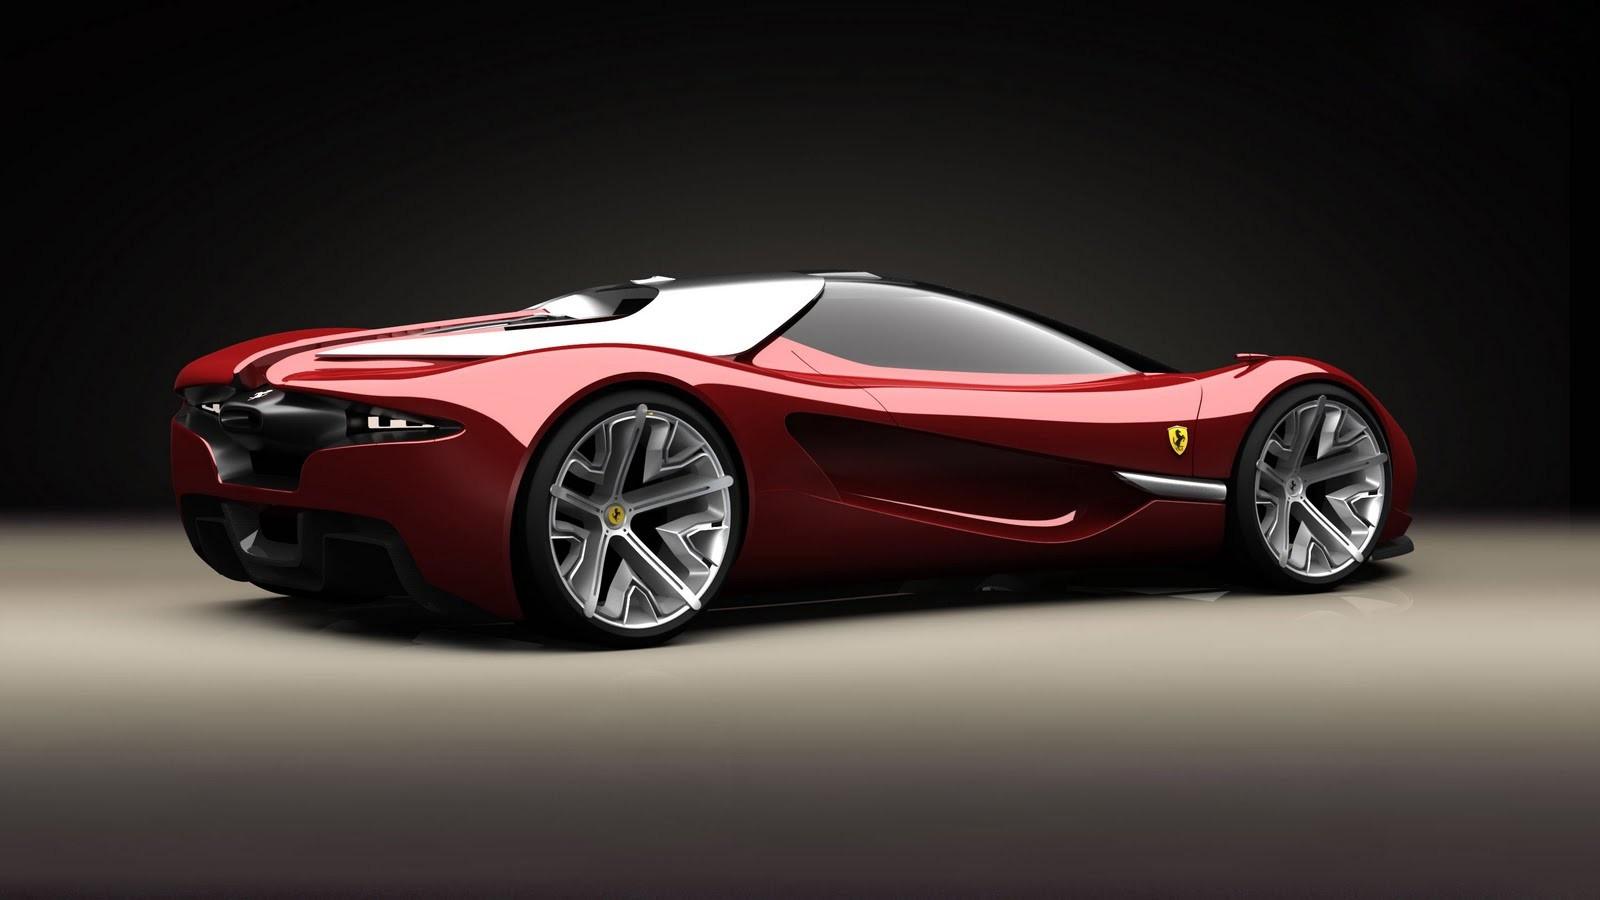 Super Cars Images 33